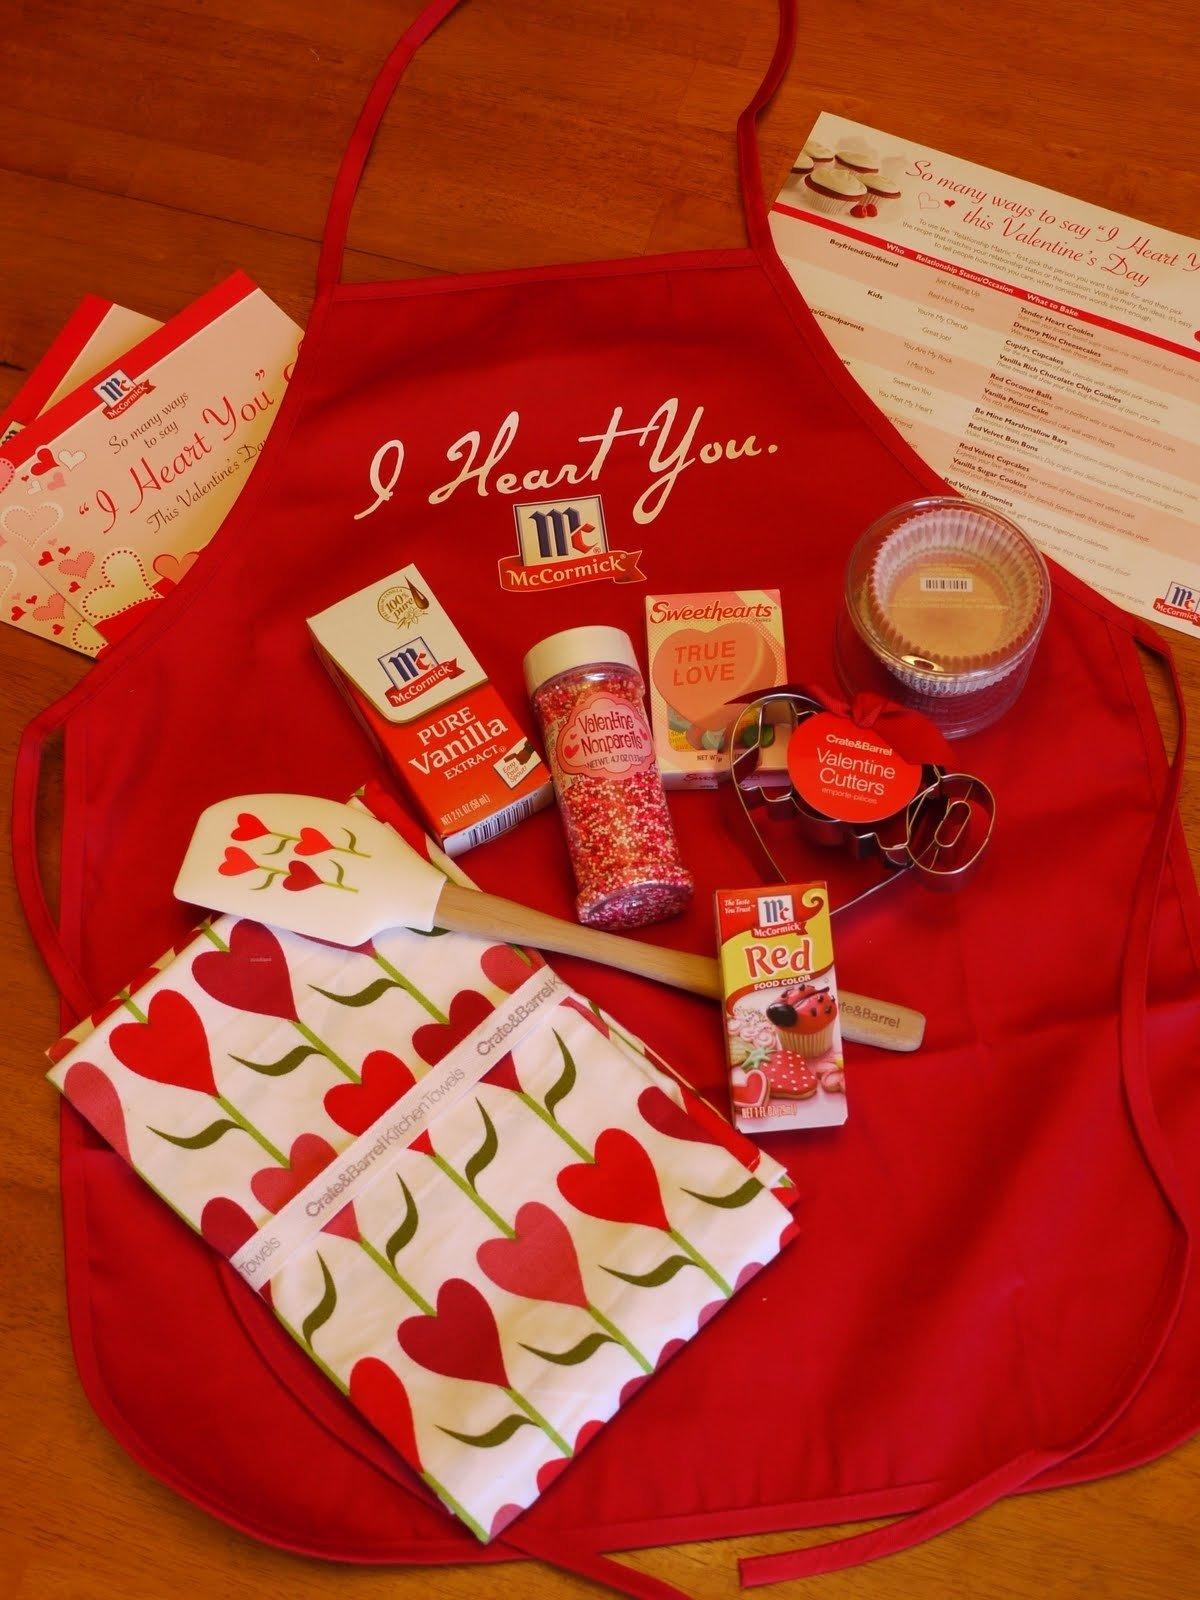 10 Stylish Gift Ideas For A New Boyfriend gift ideas for boyfriend gift ideas for new boyfriend on 3 2020